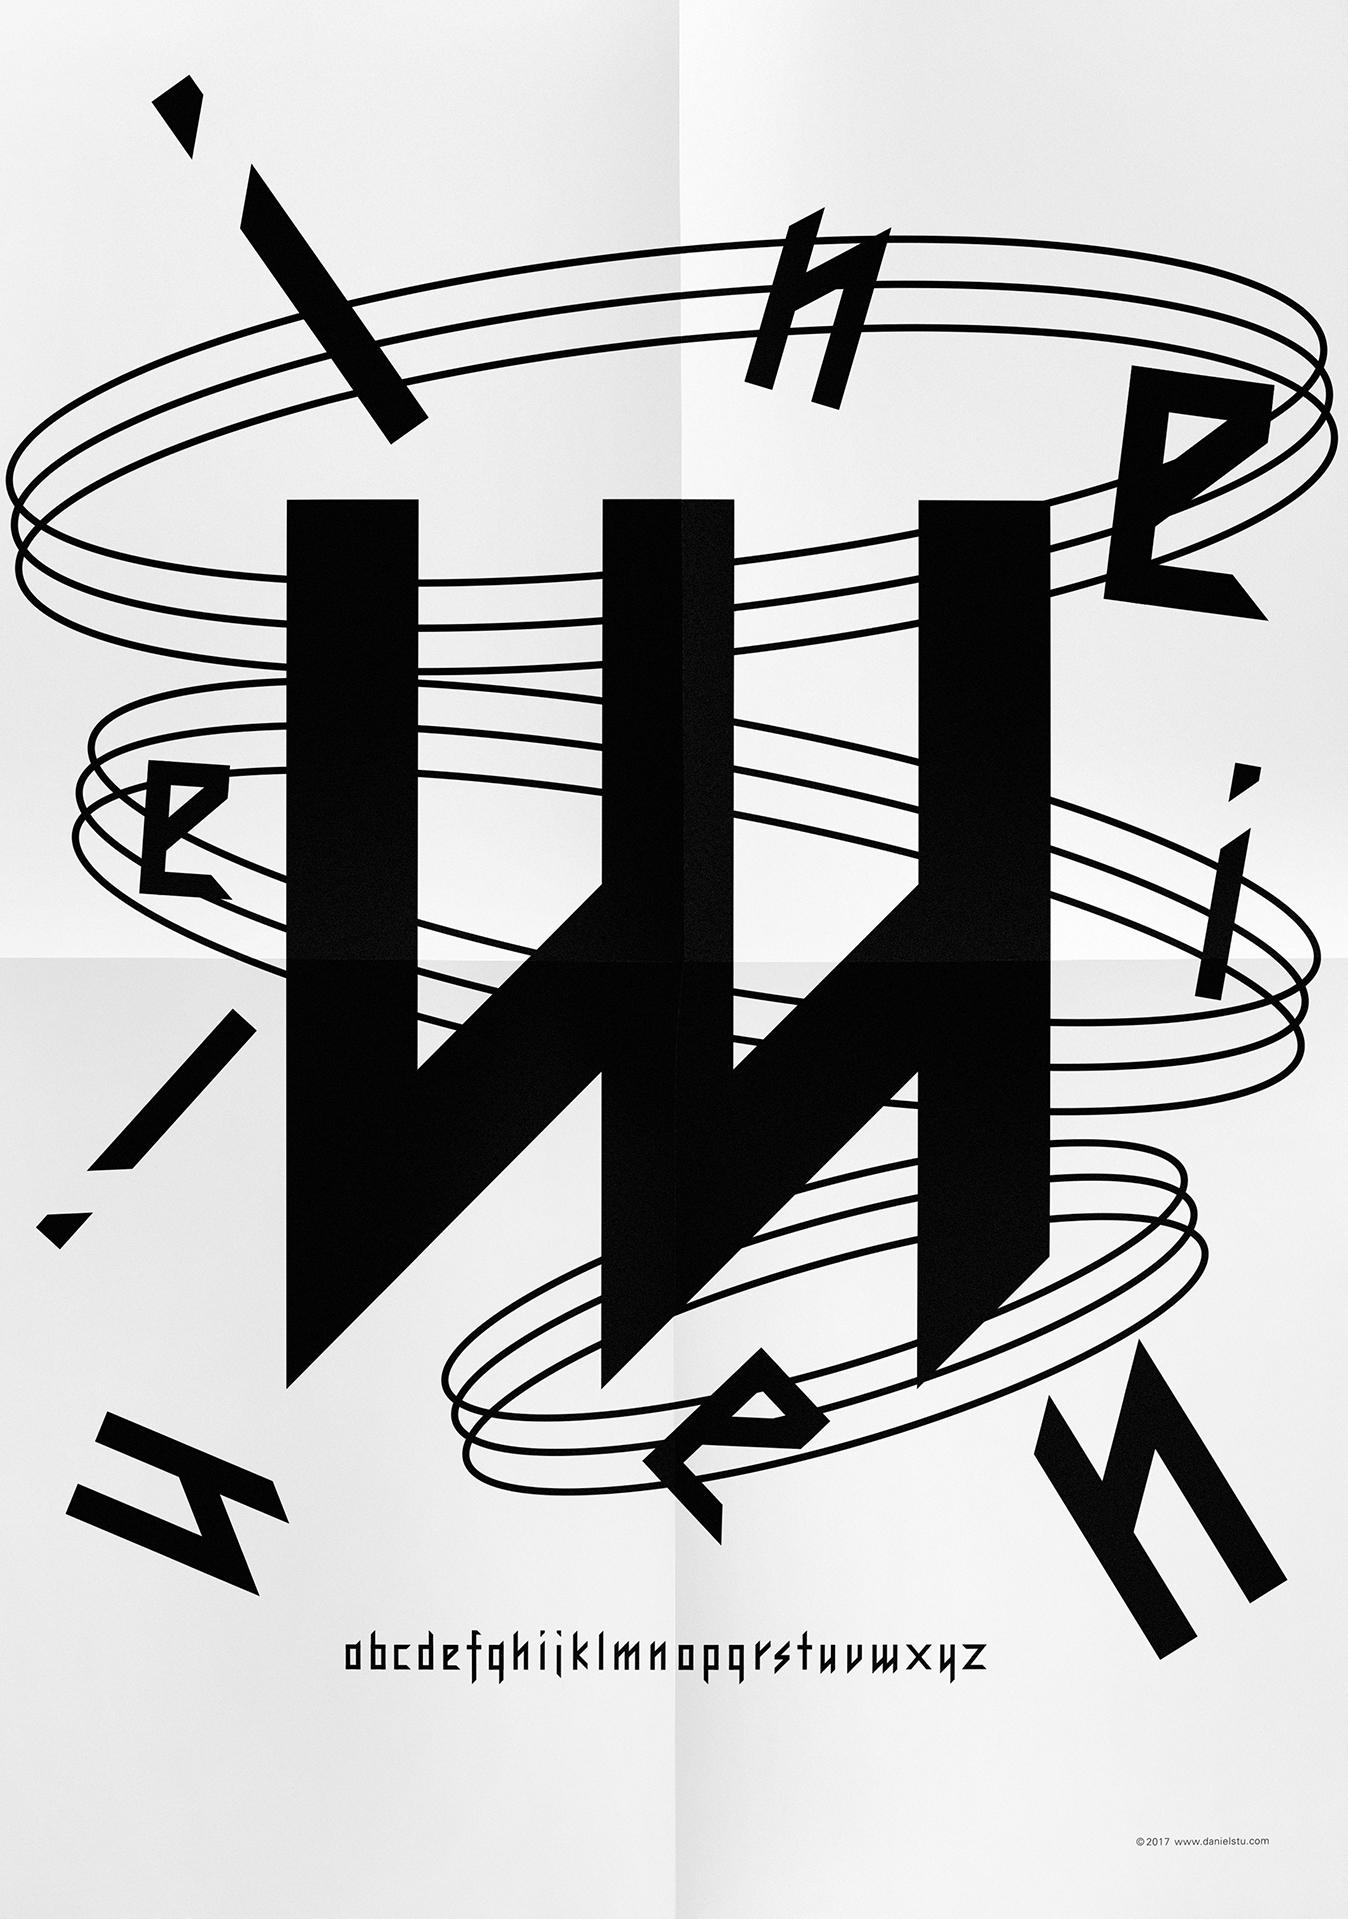 Daniel-Stuhlpfarrer_Visual-Communication_Graphic-Design_Poster_Wiener-Theater-Vienna-2